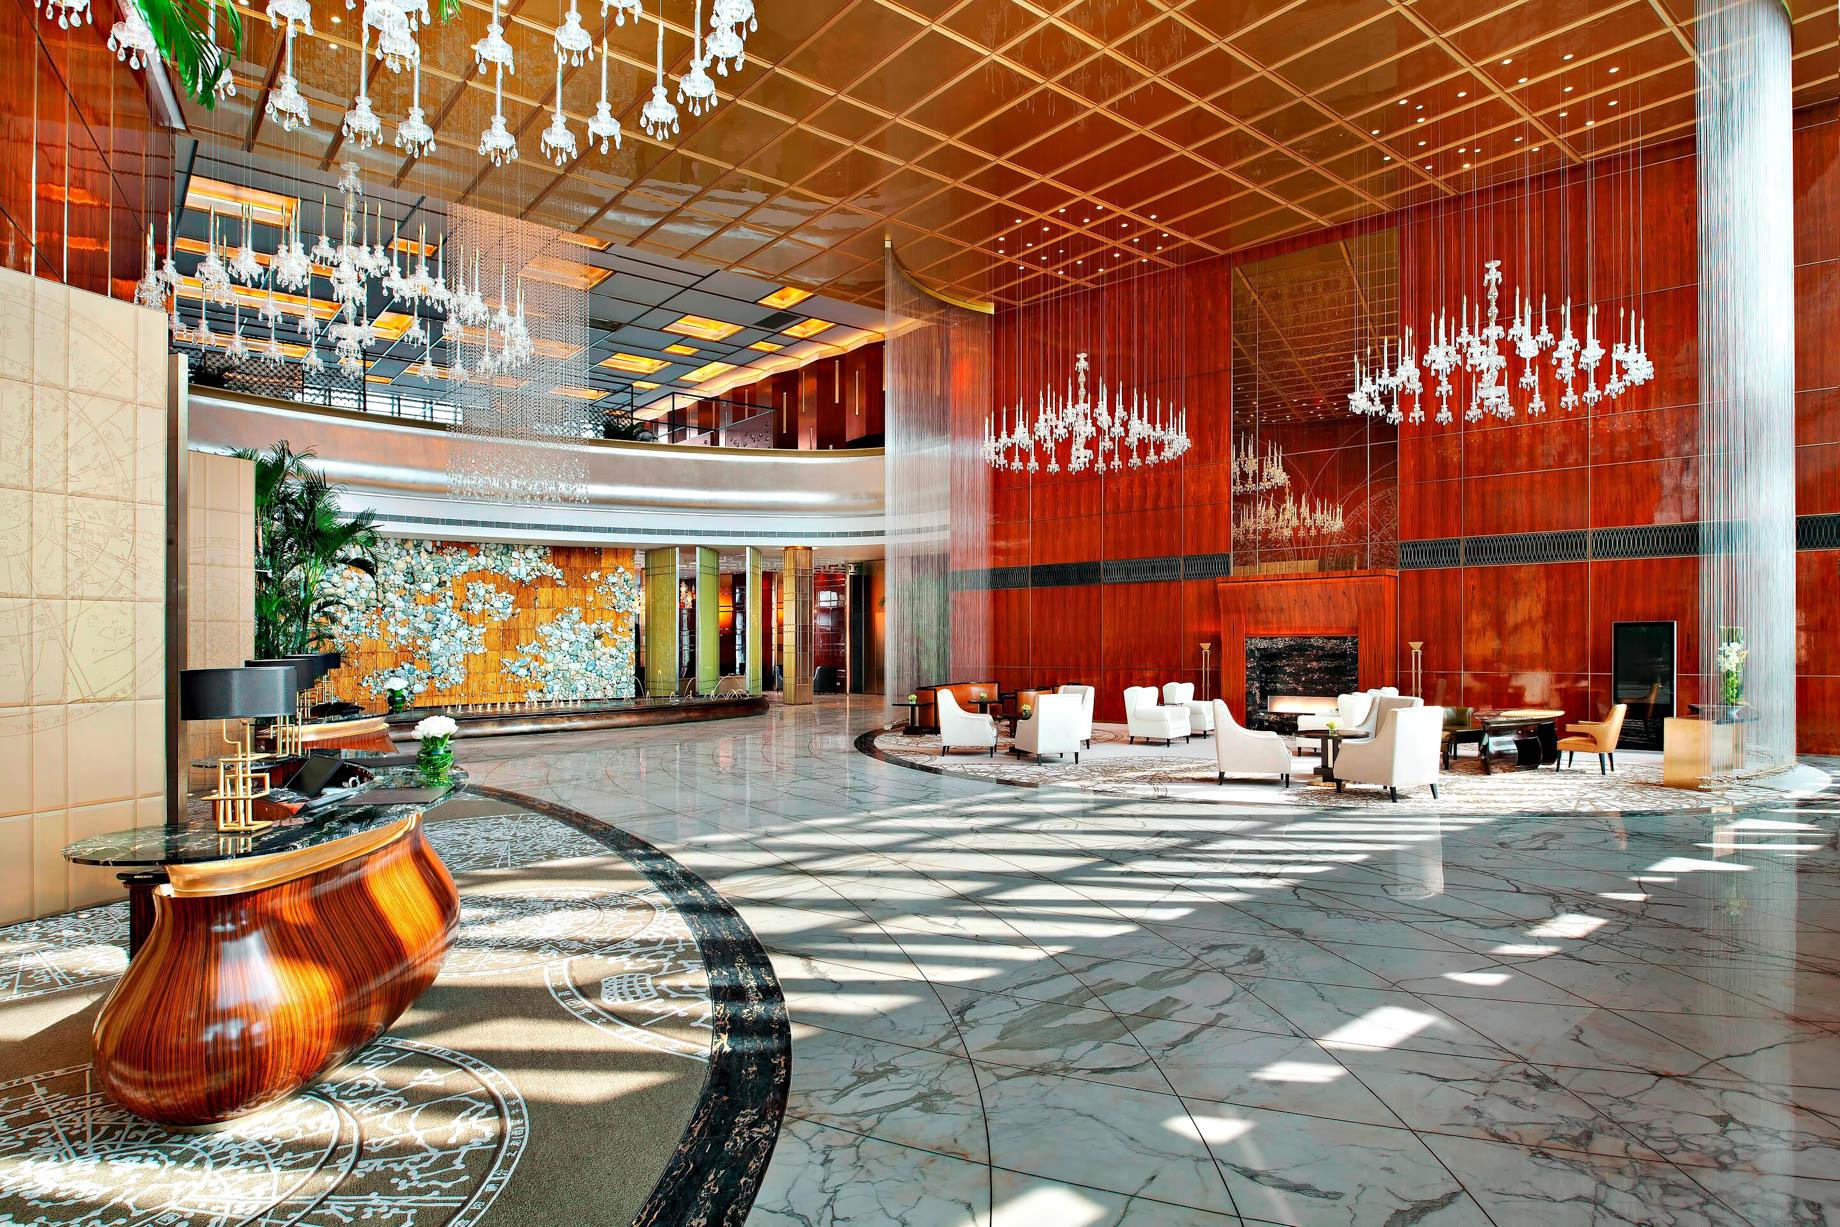 The St. Regis Tianjin Luxury Hotel - Tianjin, China - Lobby